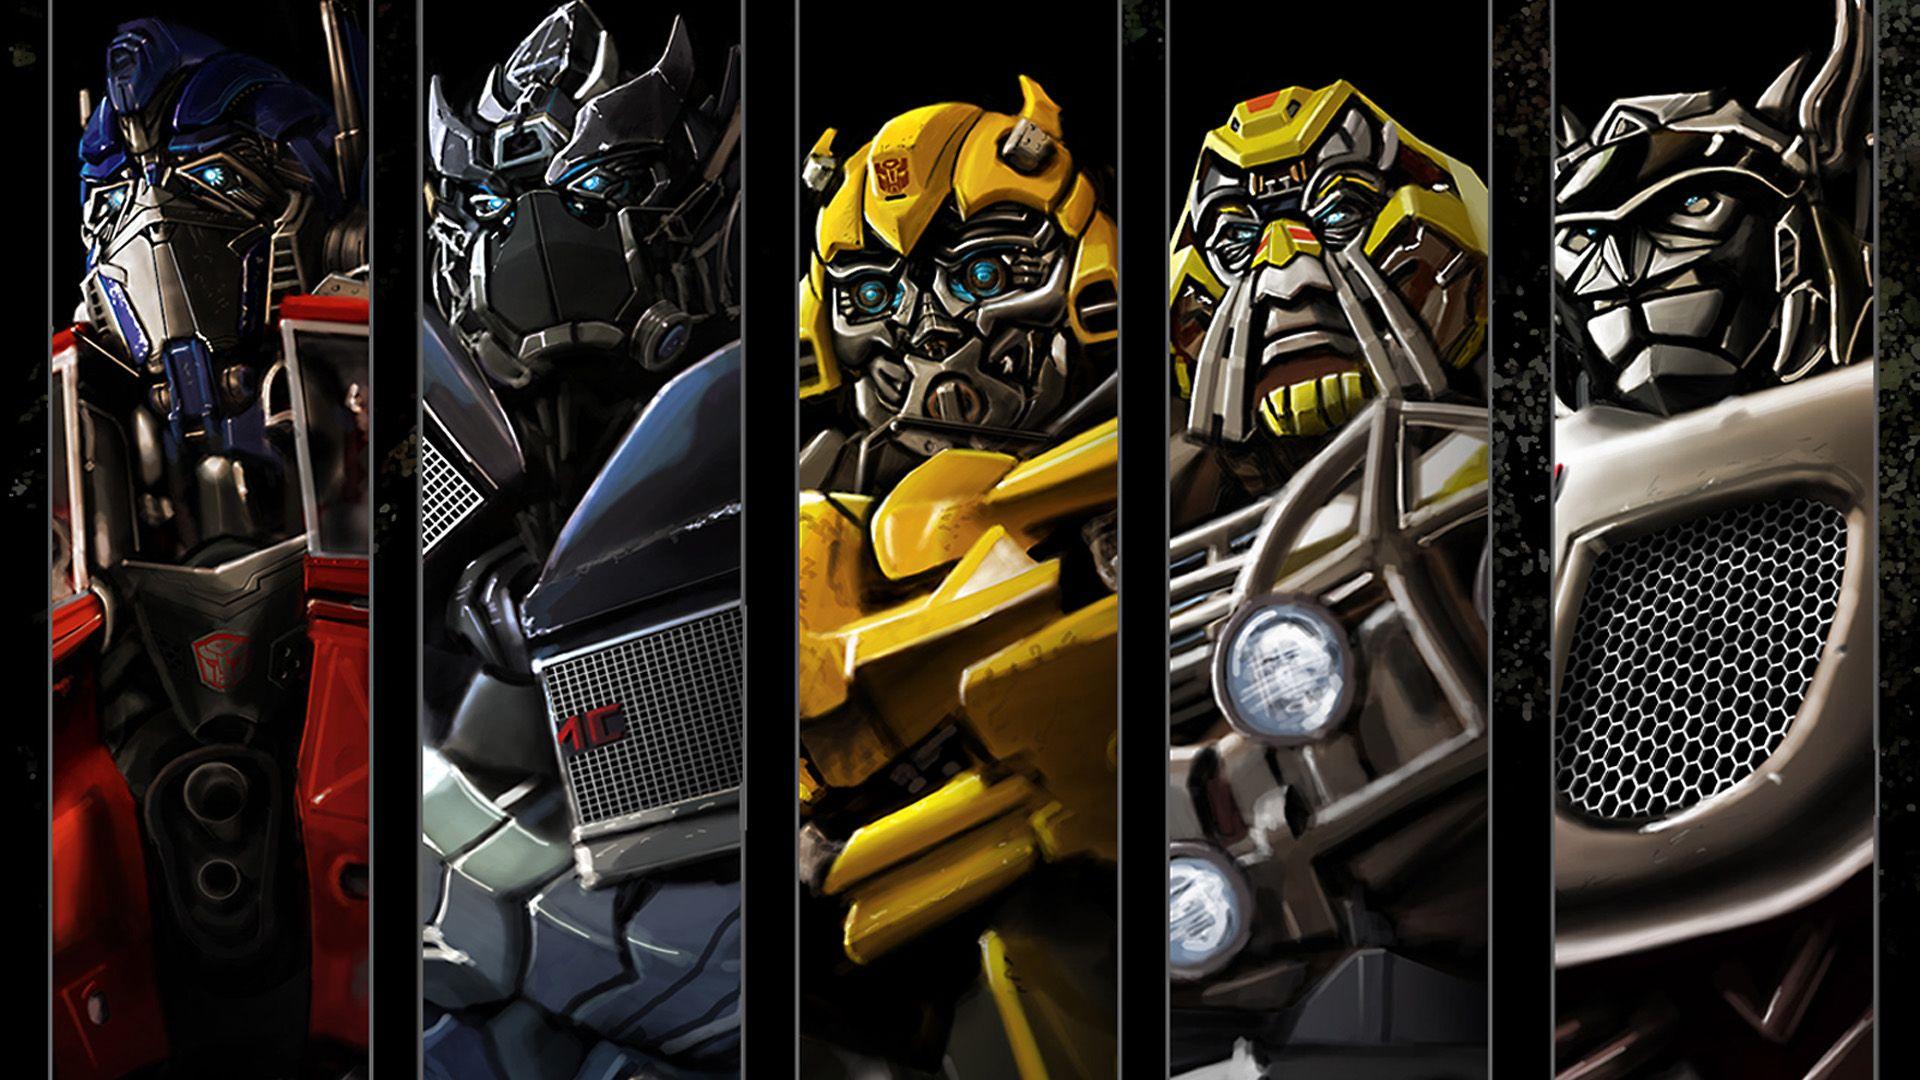 transformers wallpaper hd | comic book superhero's & villain'setc